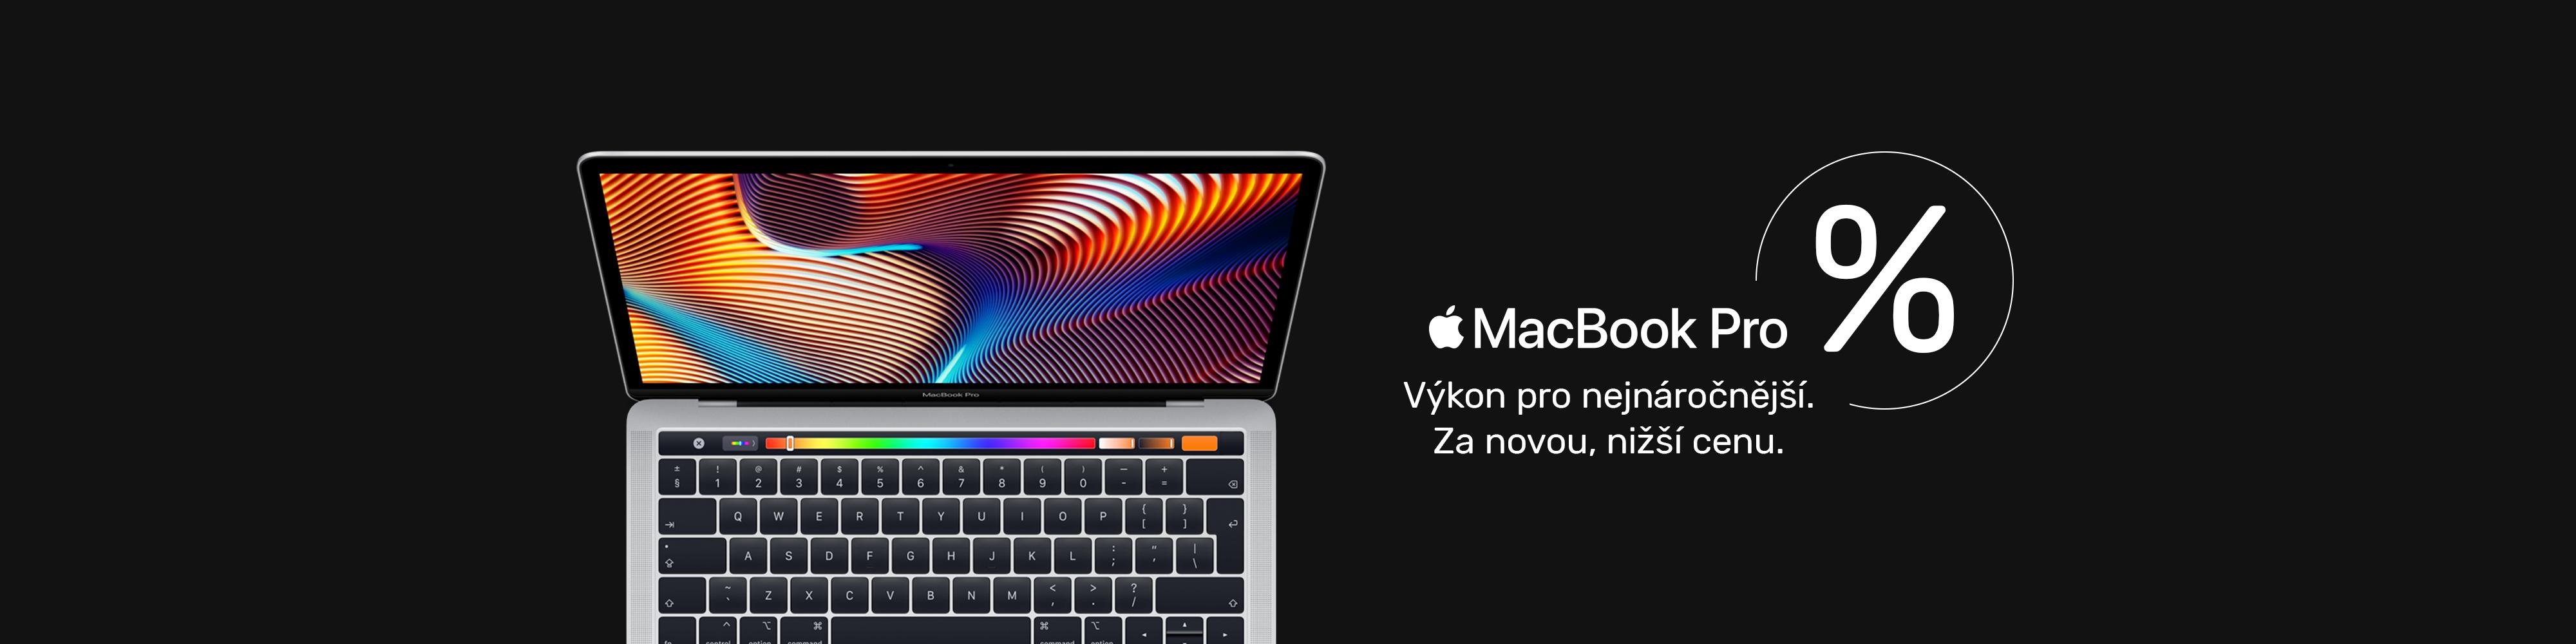 Doprodej MacBooku Pro